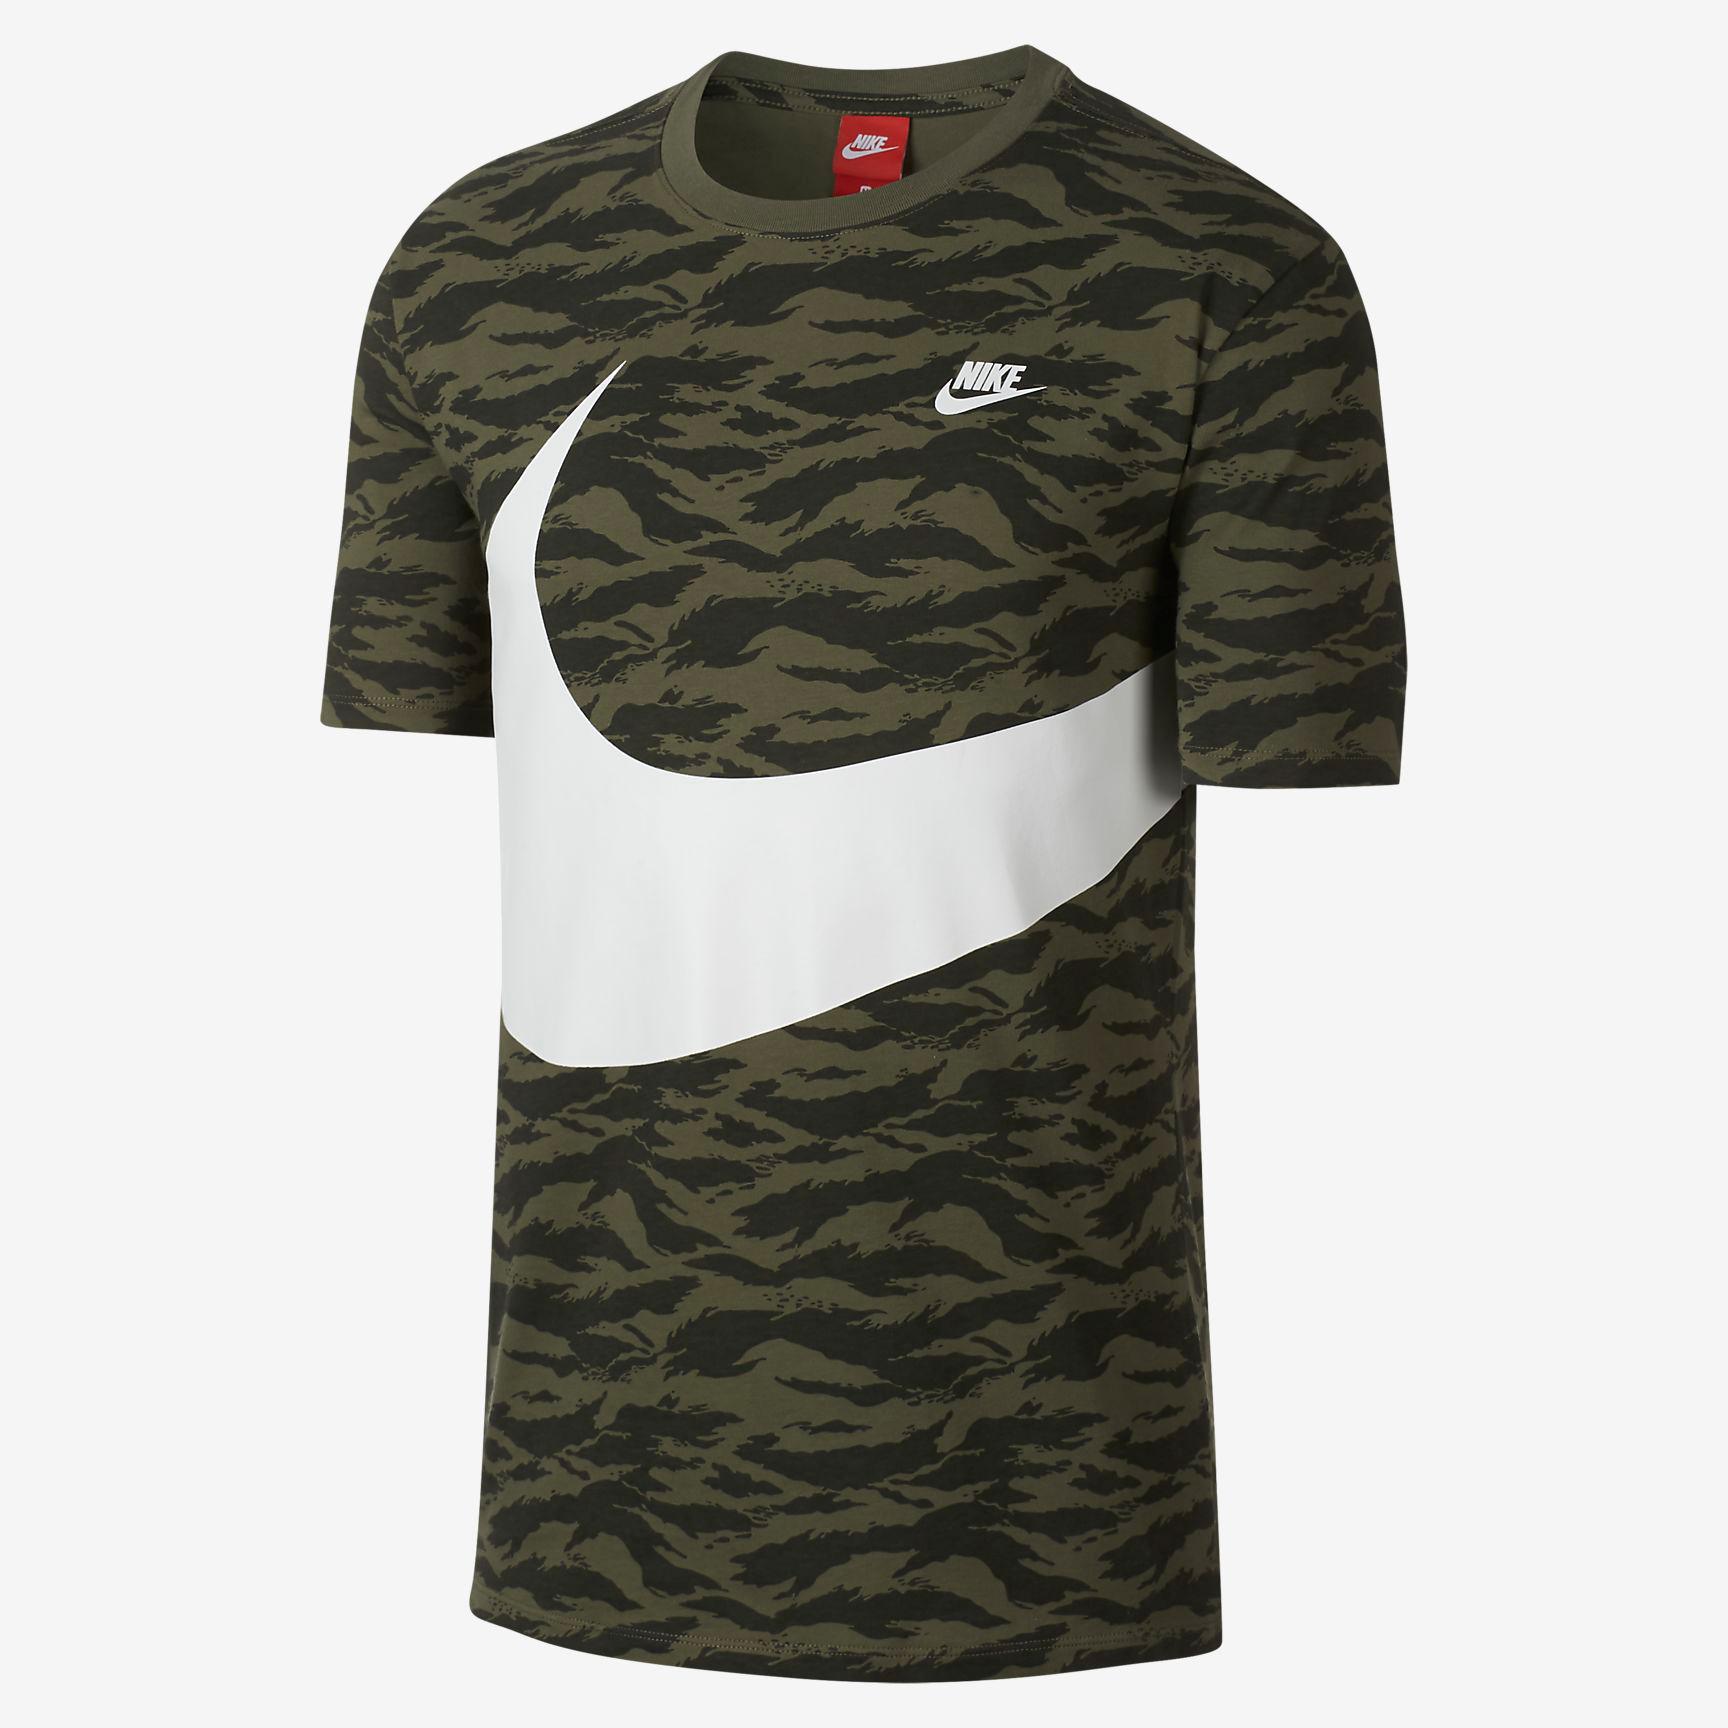 nike-air-max-97-tiger-camo-tee-shirt-match-1